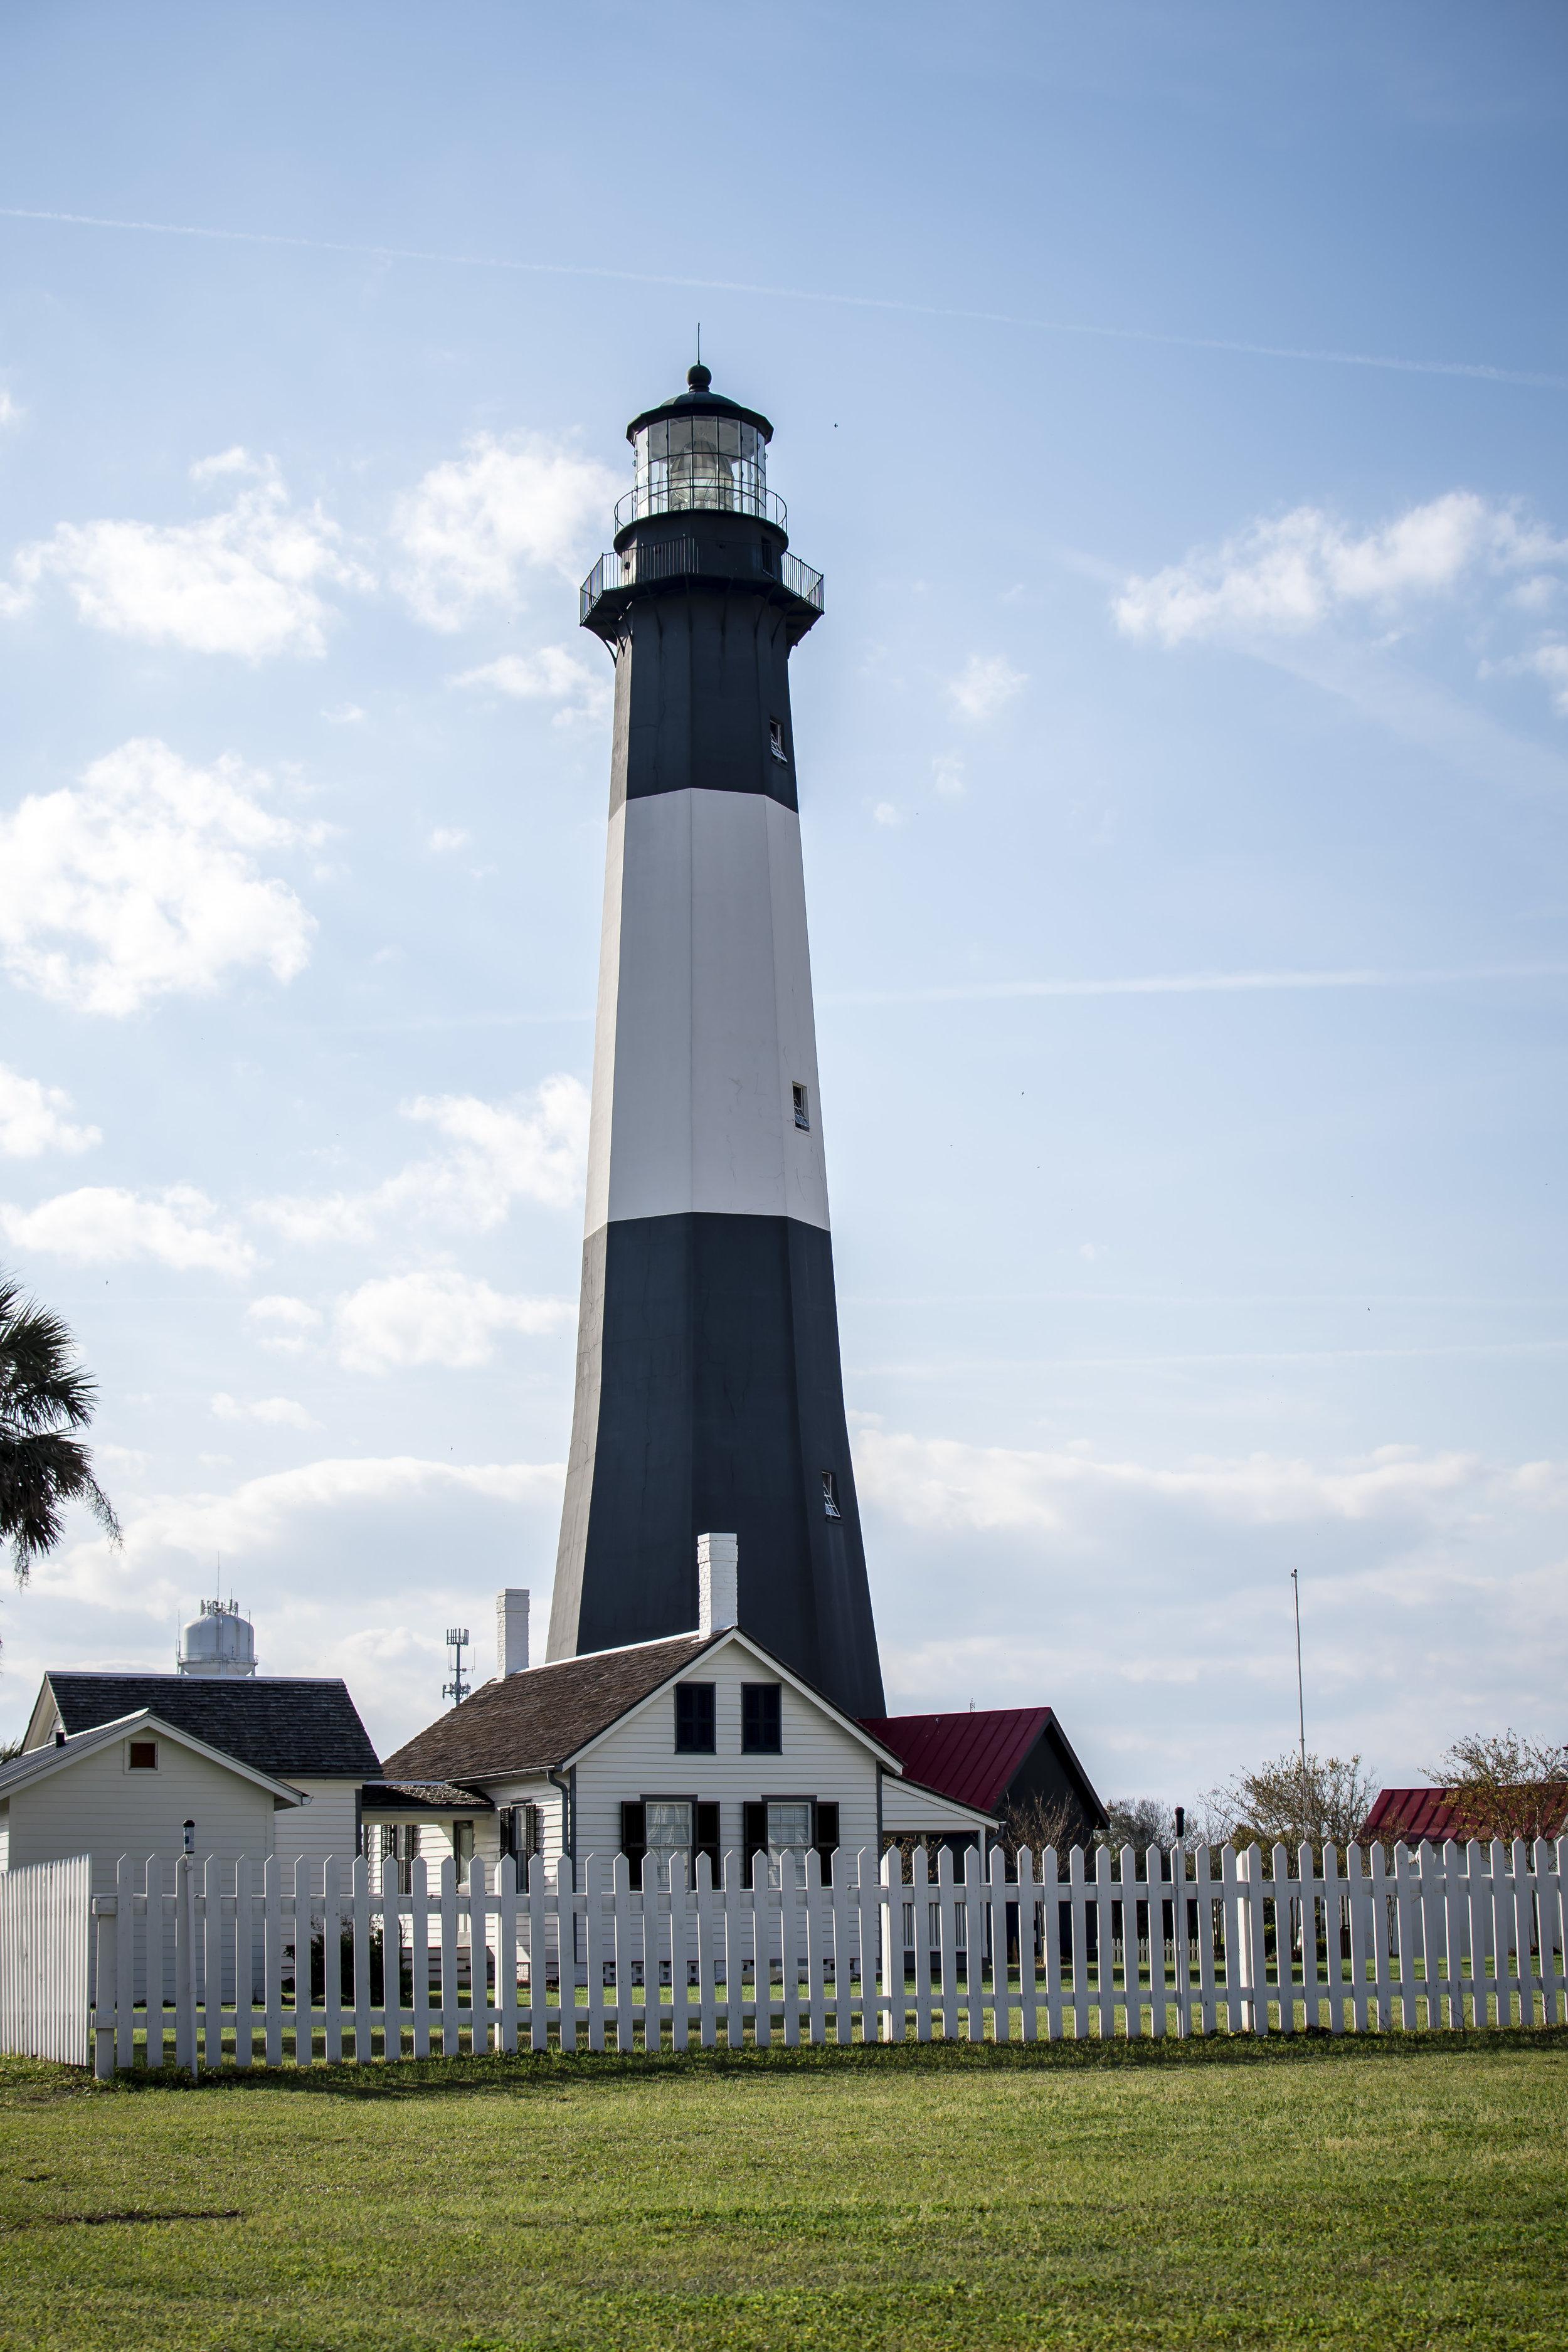 The Lighthouse in Tybee Island, GA